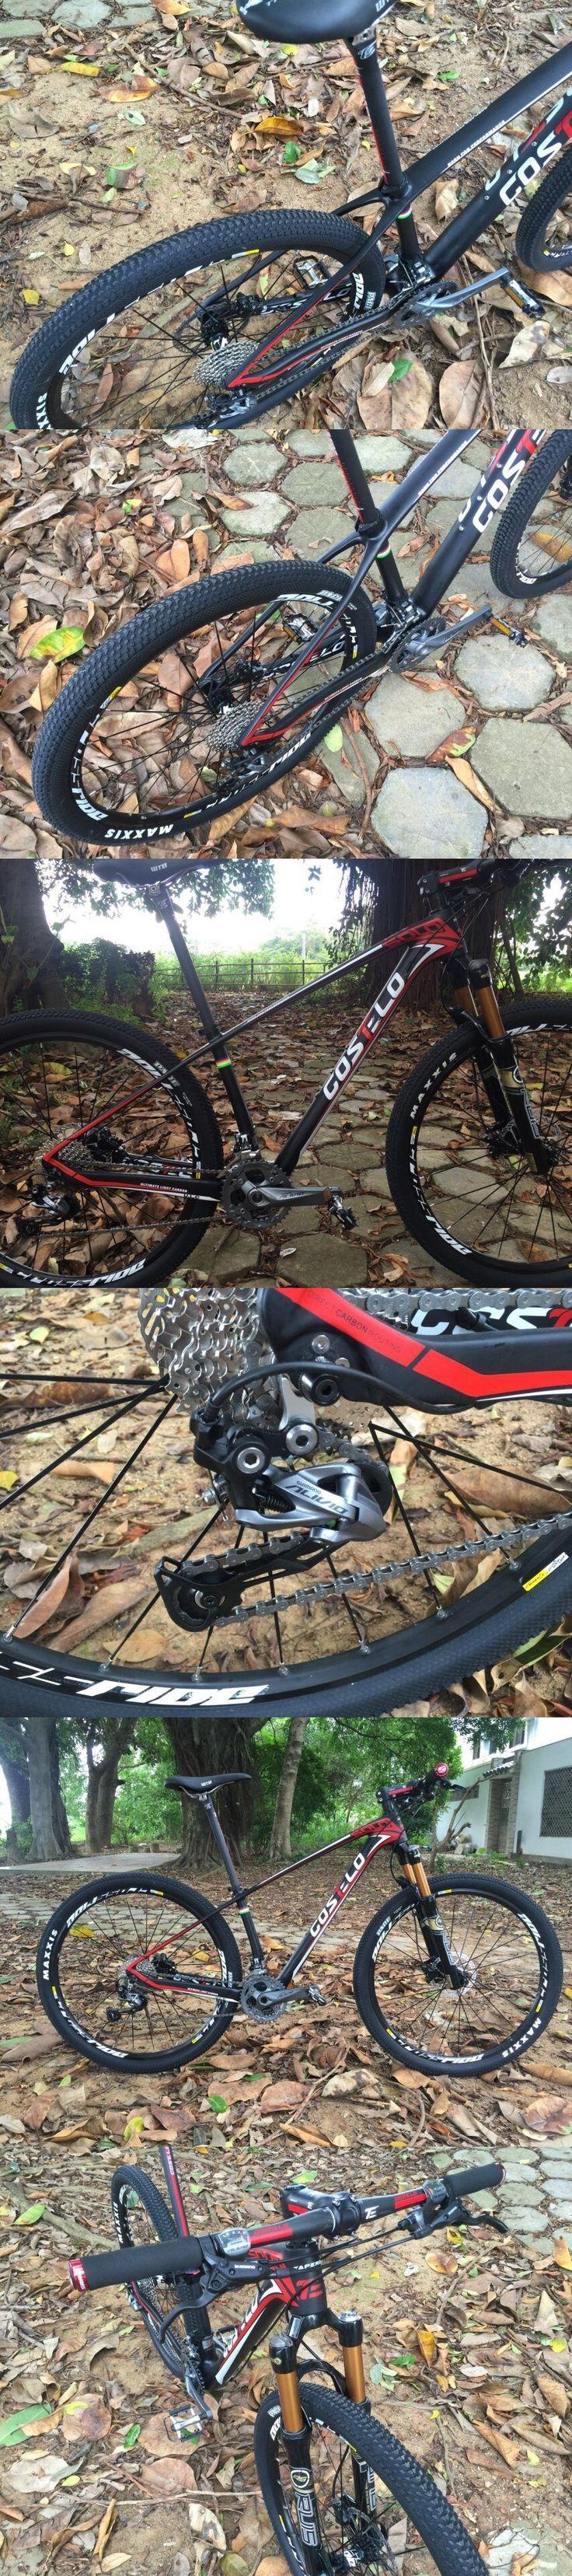 costelo bicycle MTB Frame carbon  Bicylce Mountain Bike Ultralight 27.5 MTB Frame M4000 groups wheels saddle bar tire